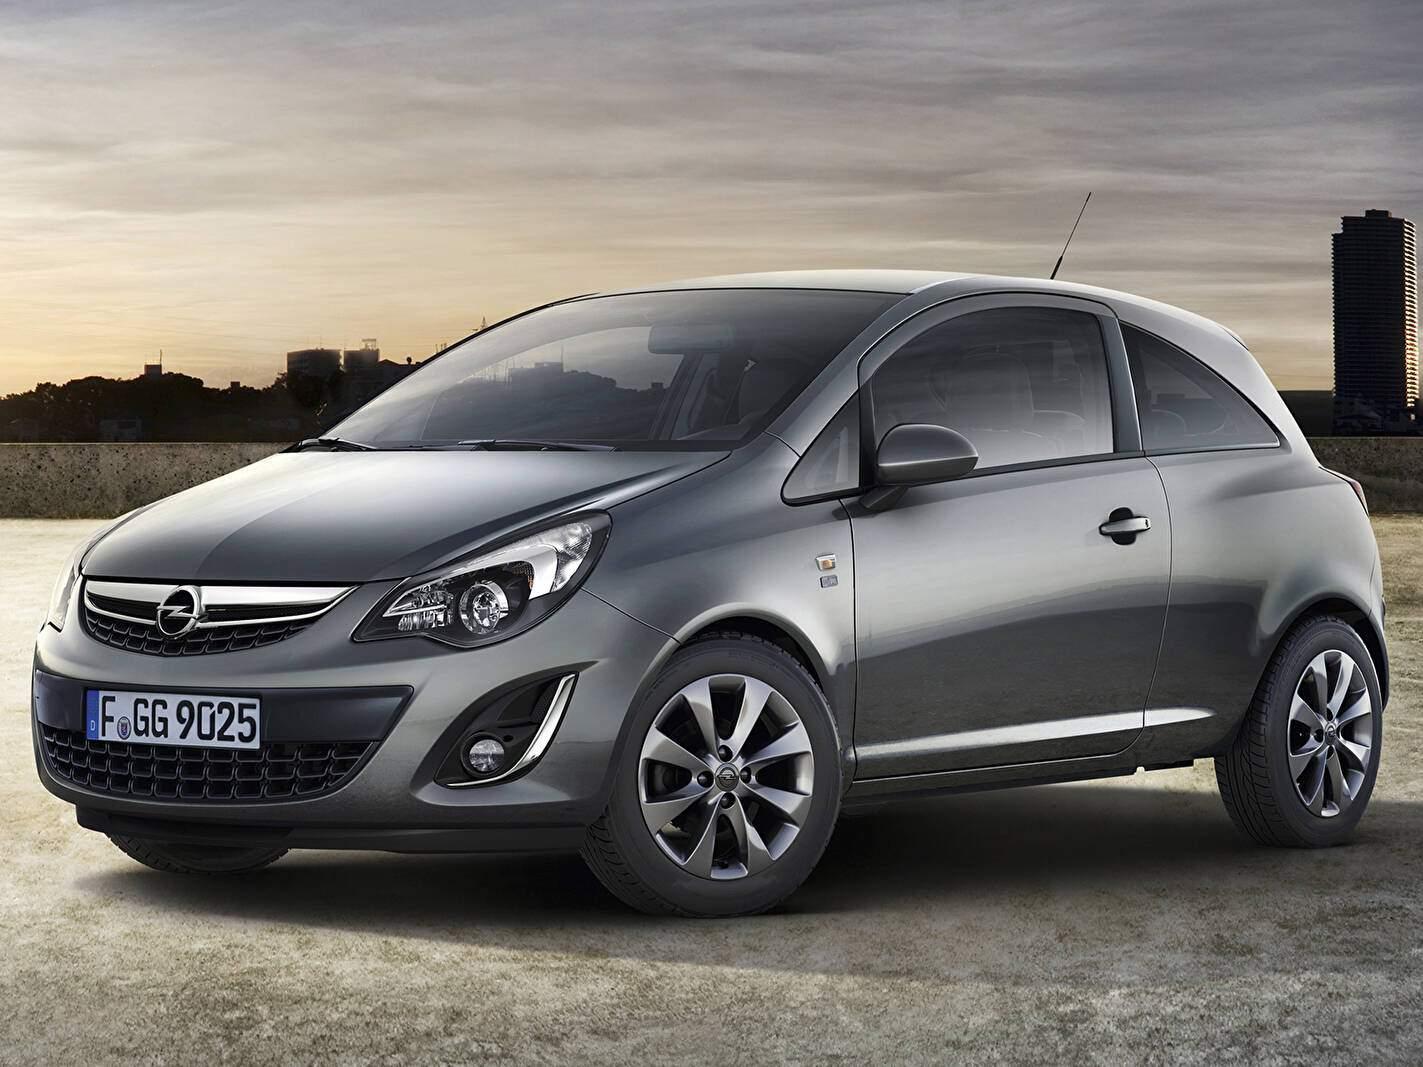 Opel Corsa IV 1.2 Twinport 85 « 150th Anniversary » (2012),  ajouté par fox58